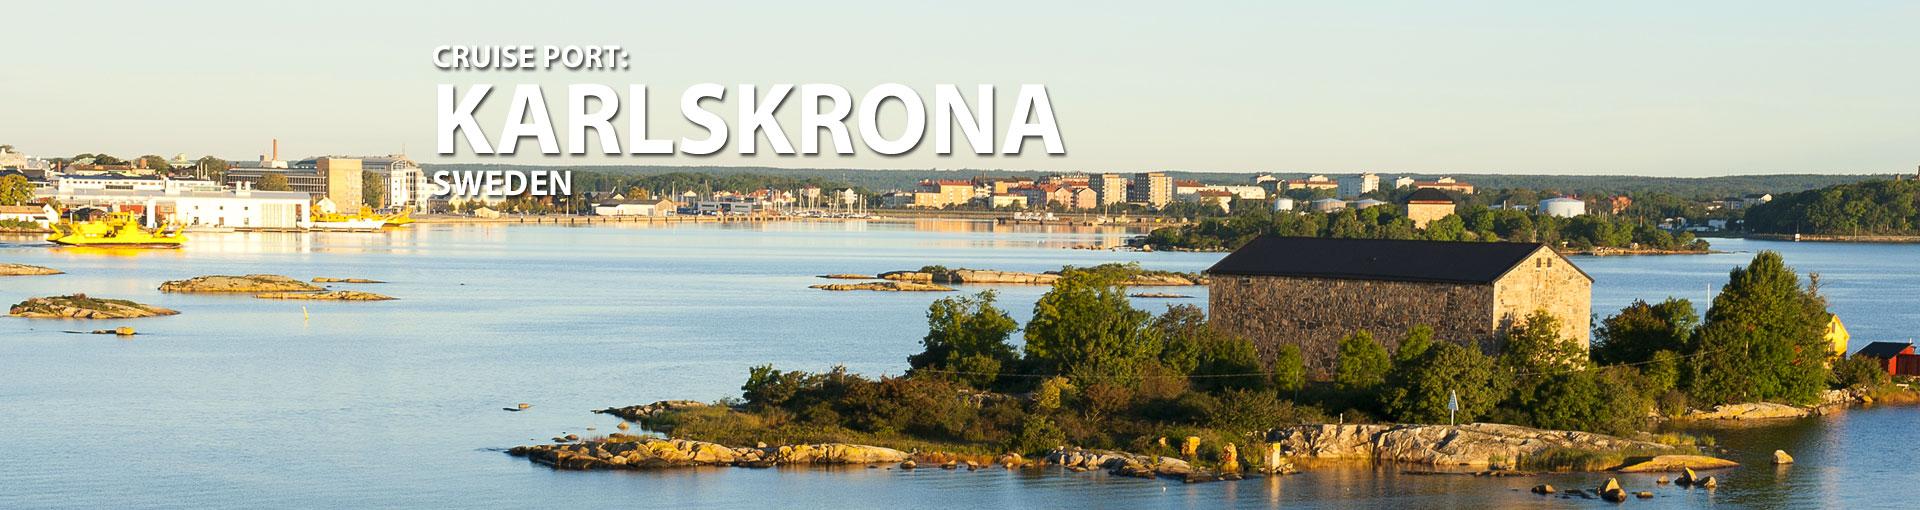 Cruises to Karlskrona, Sweden